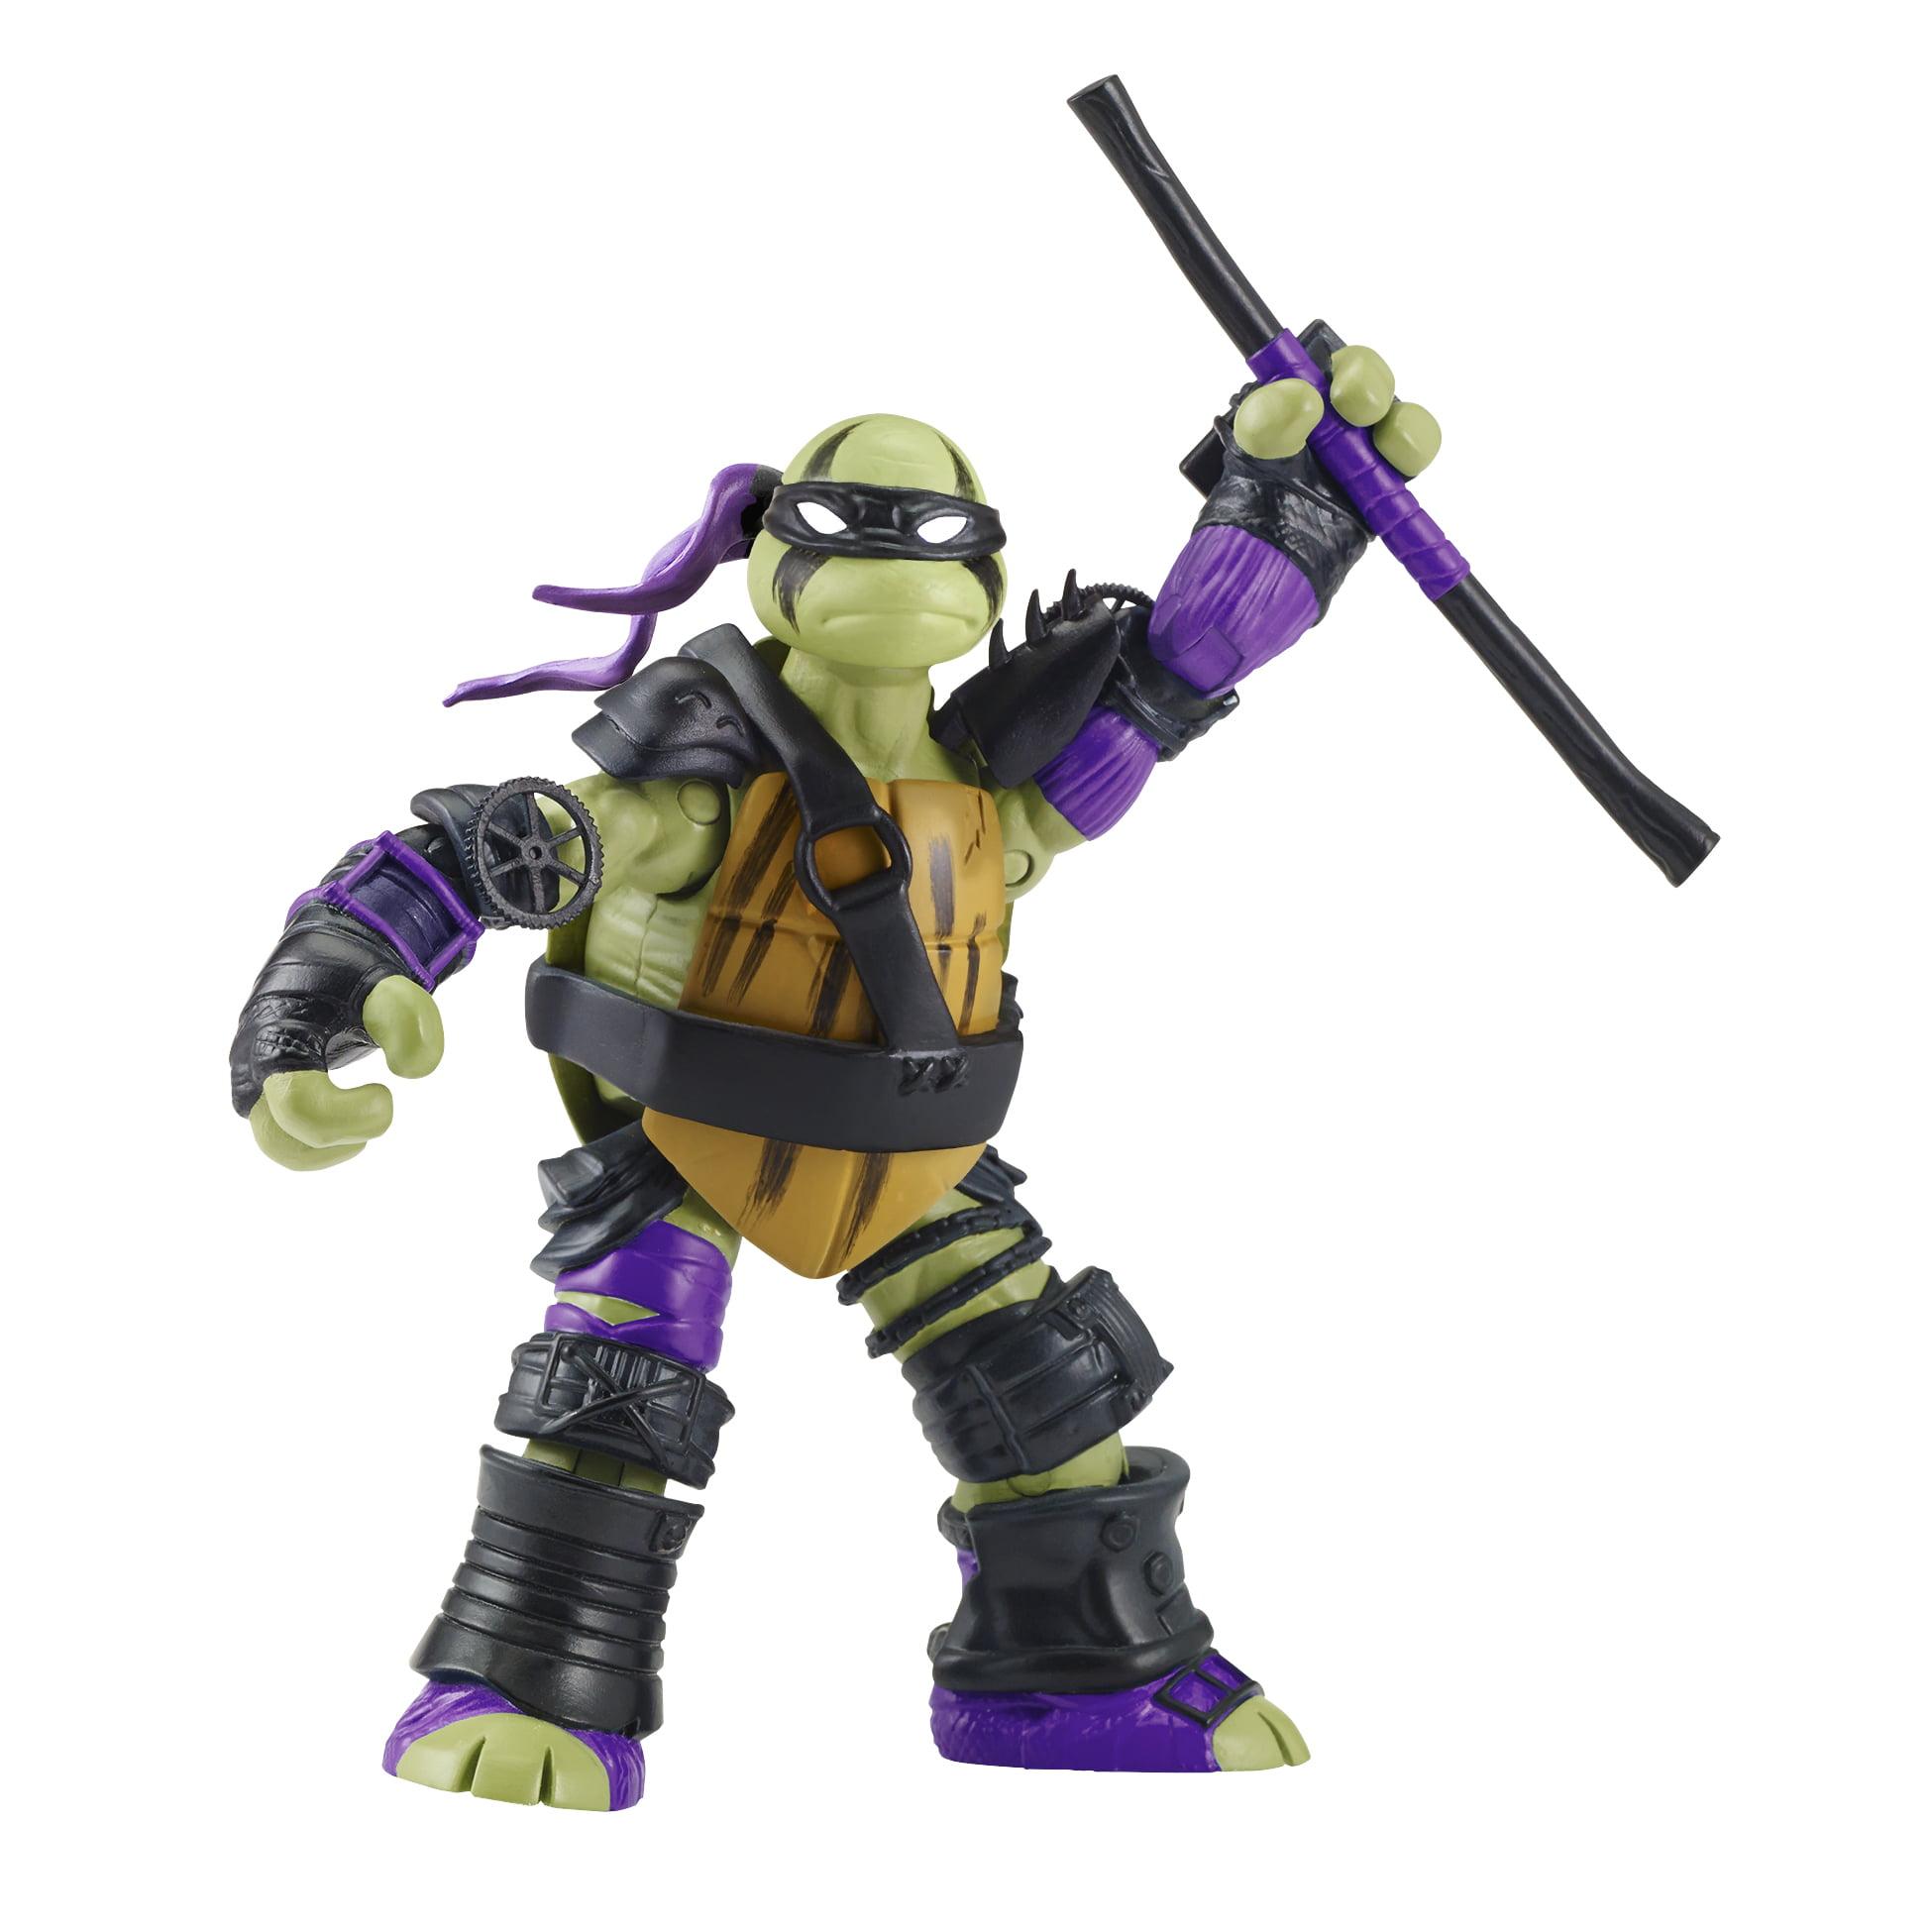 "TMNT 5"" Super Ninja Donatello Basic Action Figure by Playmates Toys"